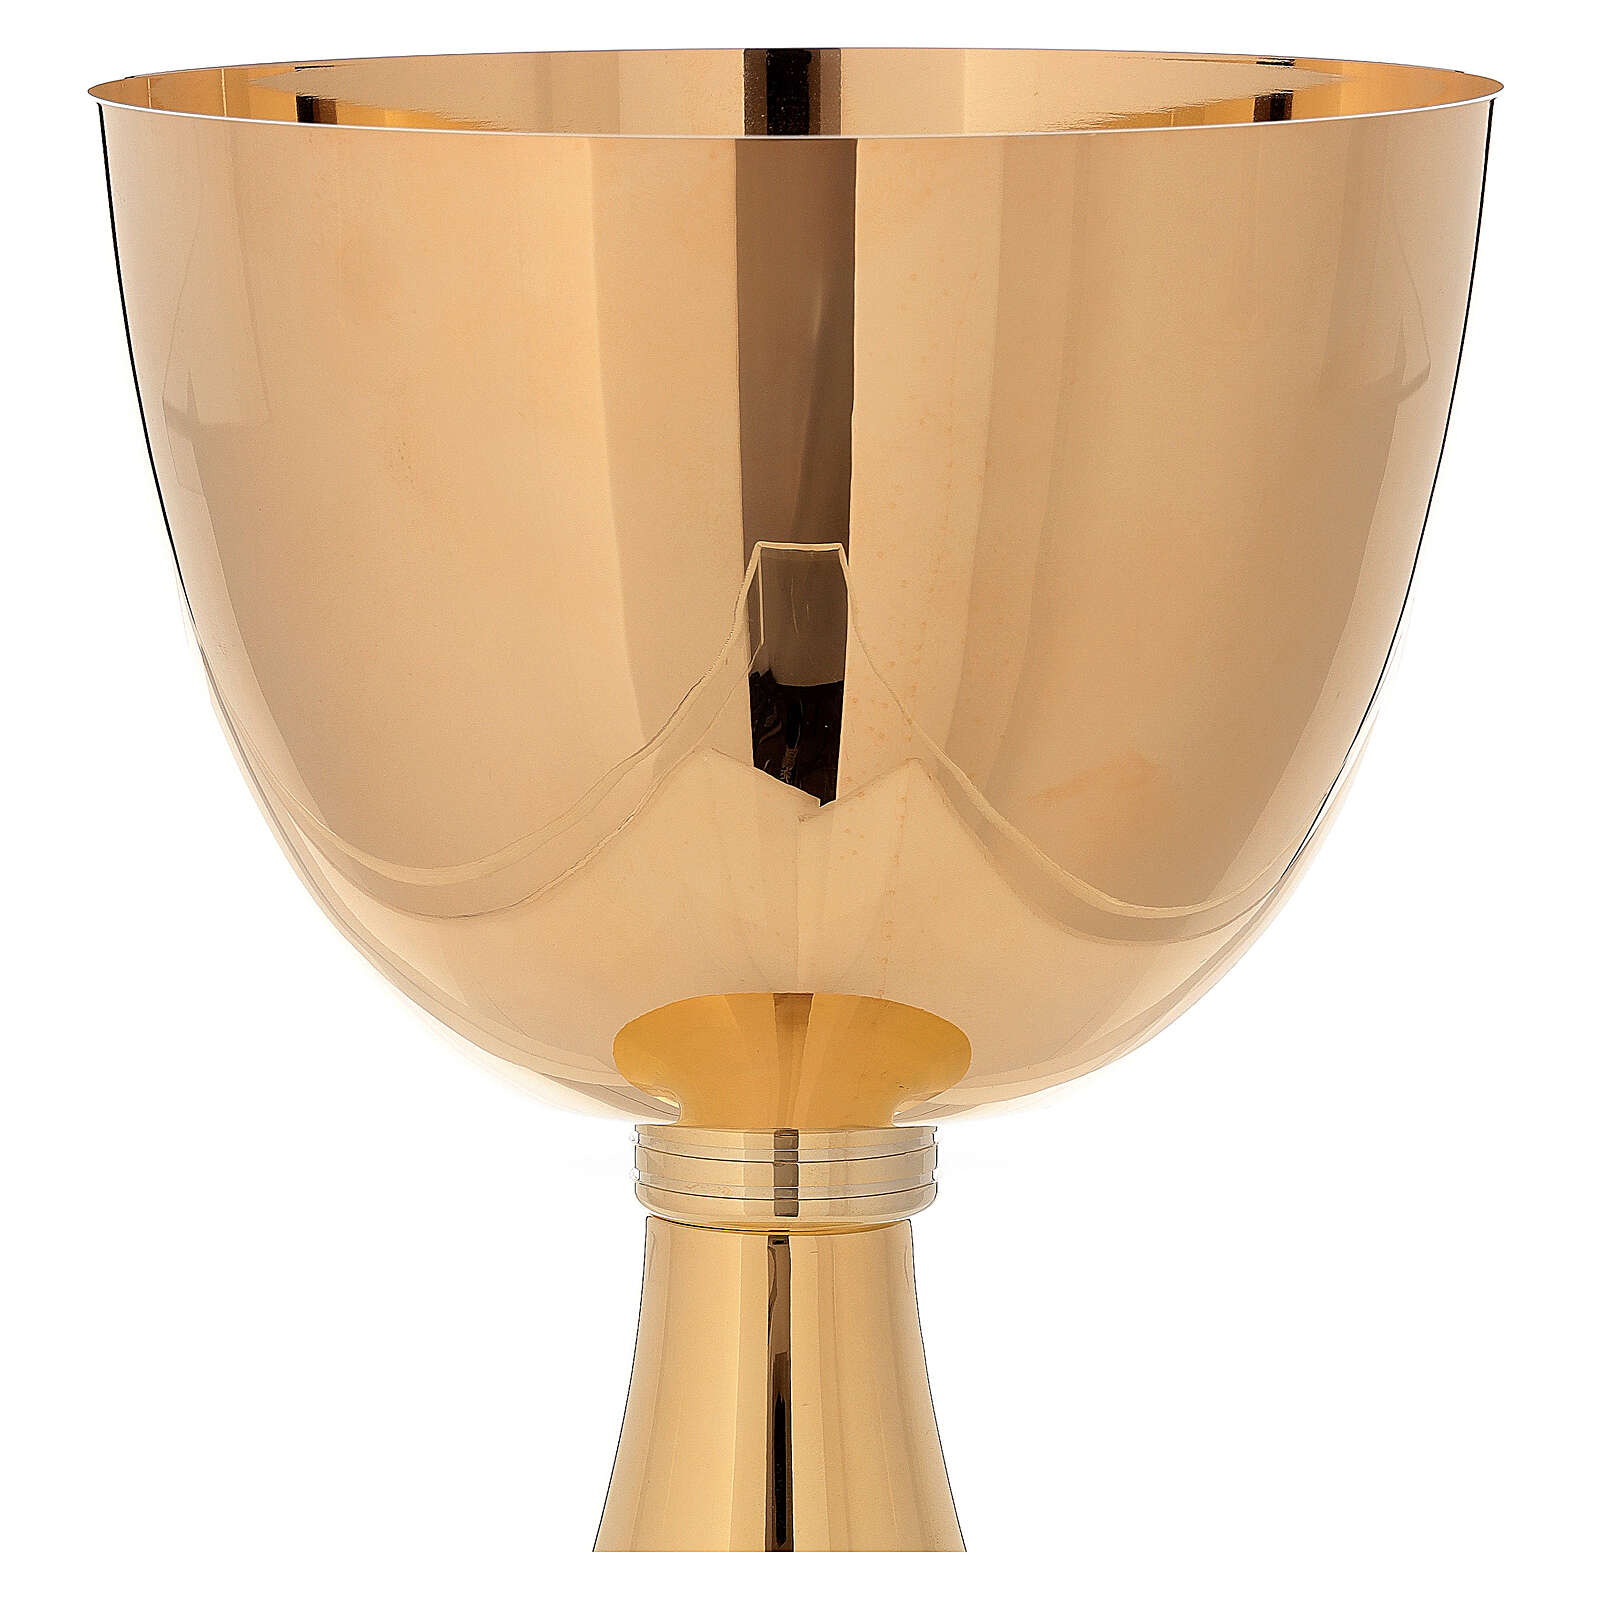 Chalice Concelebration 750 ml 24-karat gold plated brass simple base 4